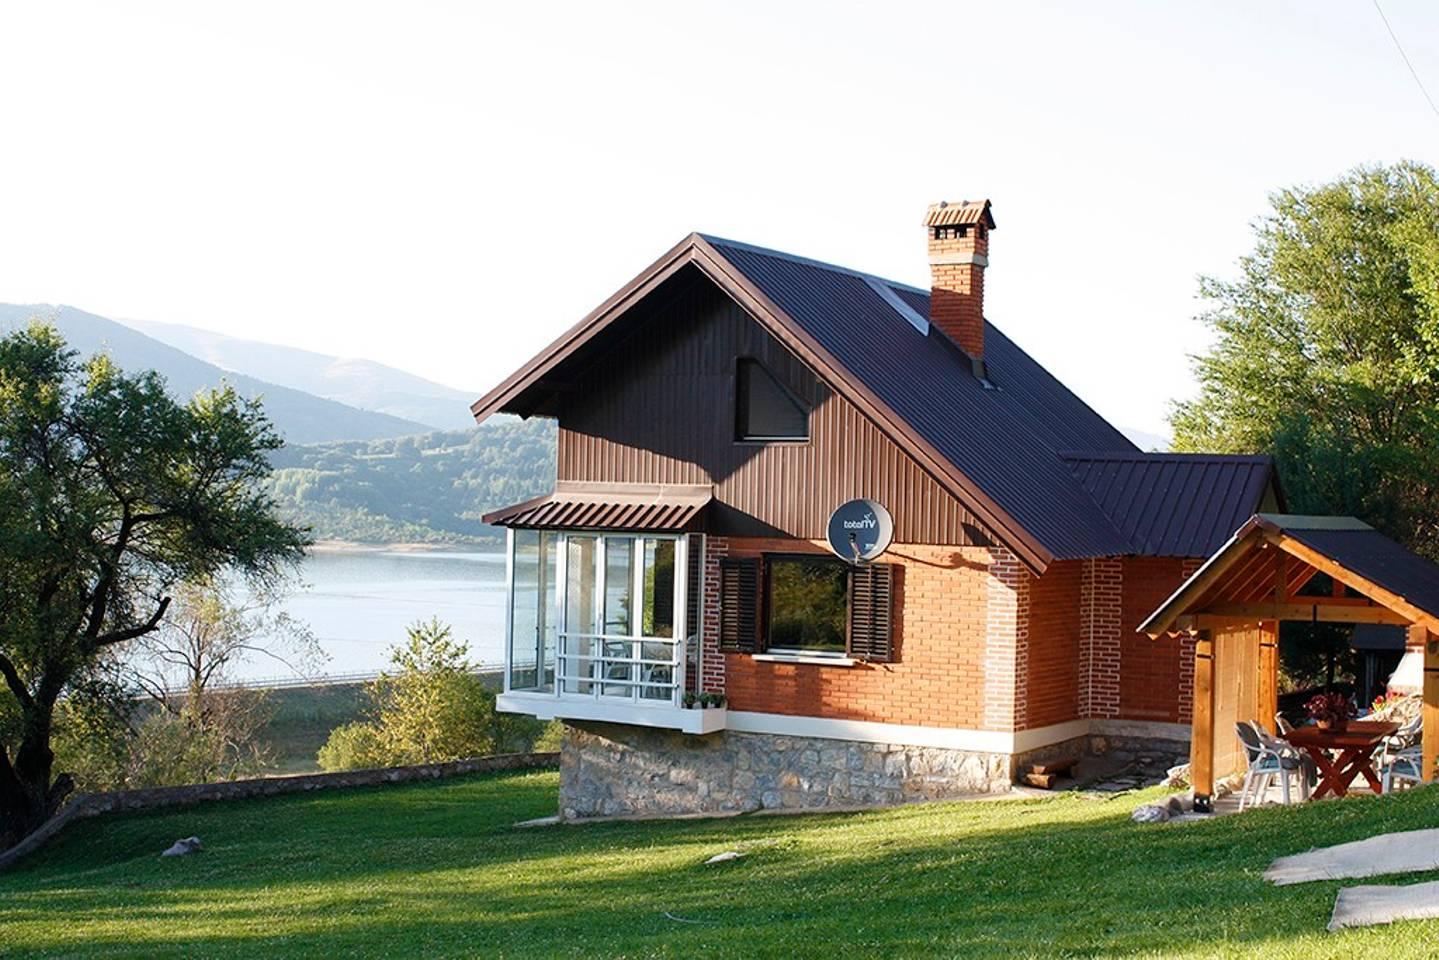 maison campagne macdoine